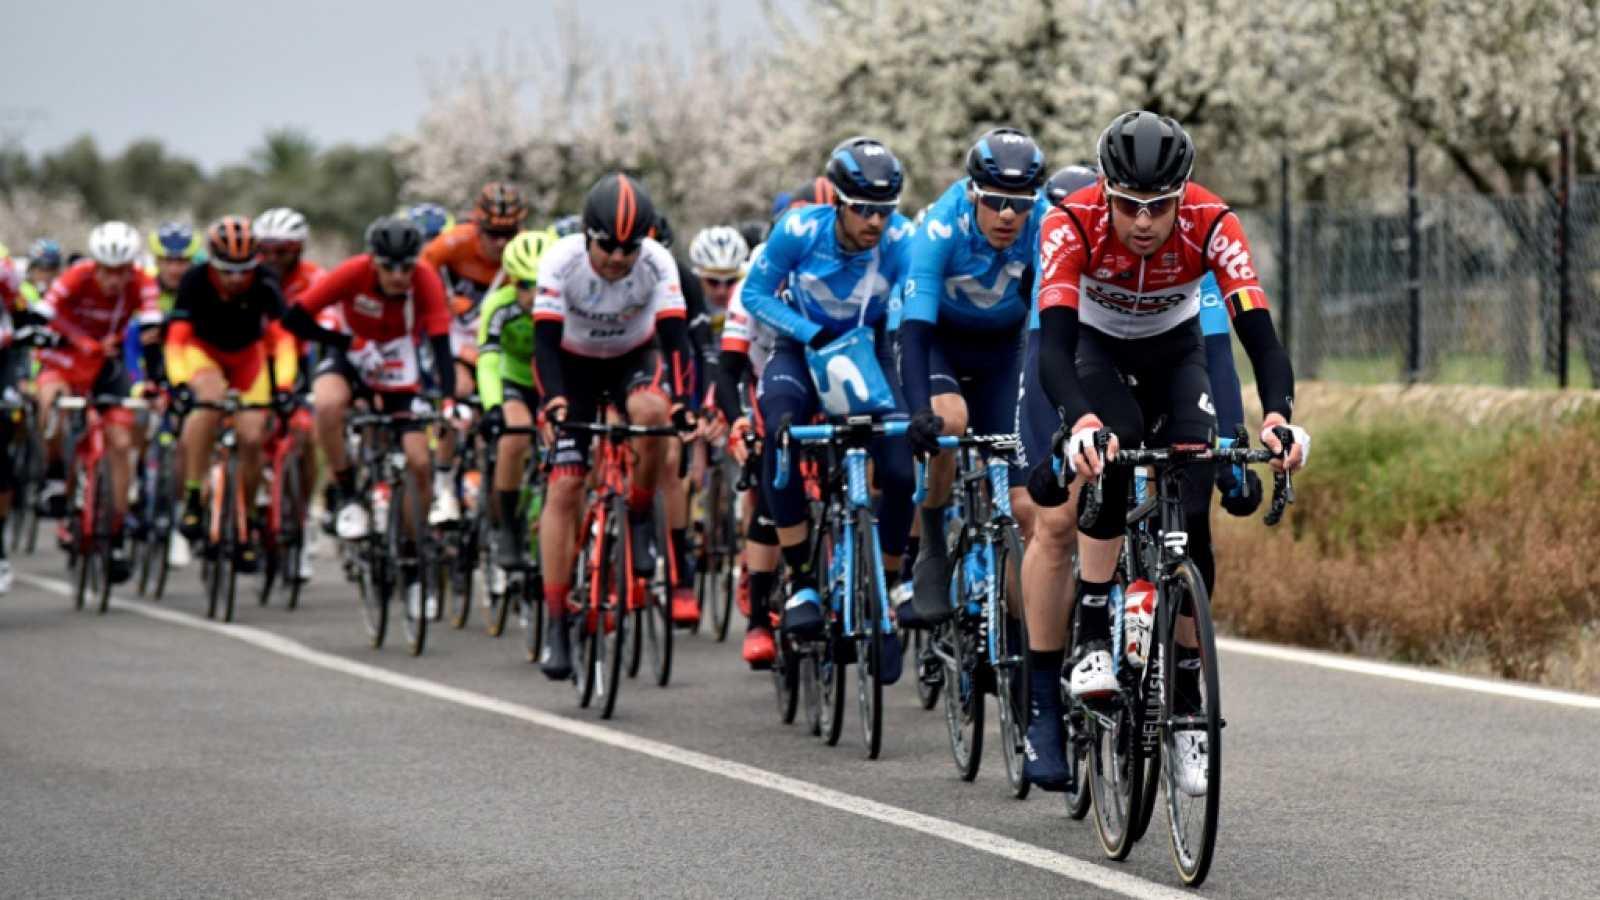 Ciclismo - Challenge ciclista Mallorca 3ª jornada Trofeo Serra de Tramuntana - ver ahora